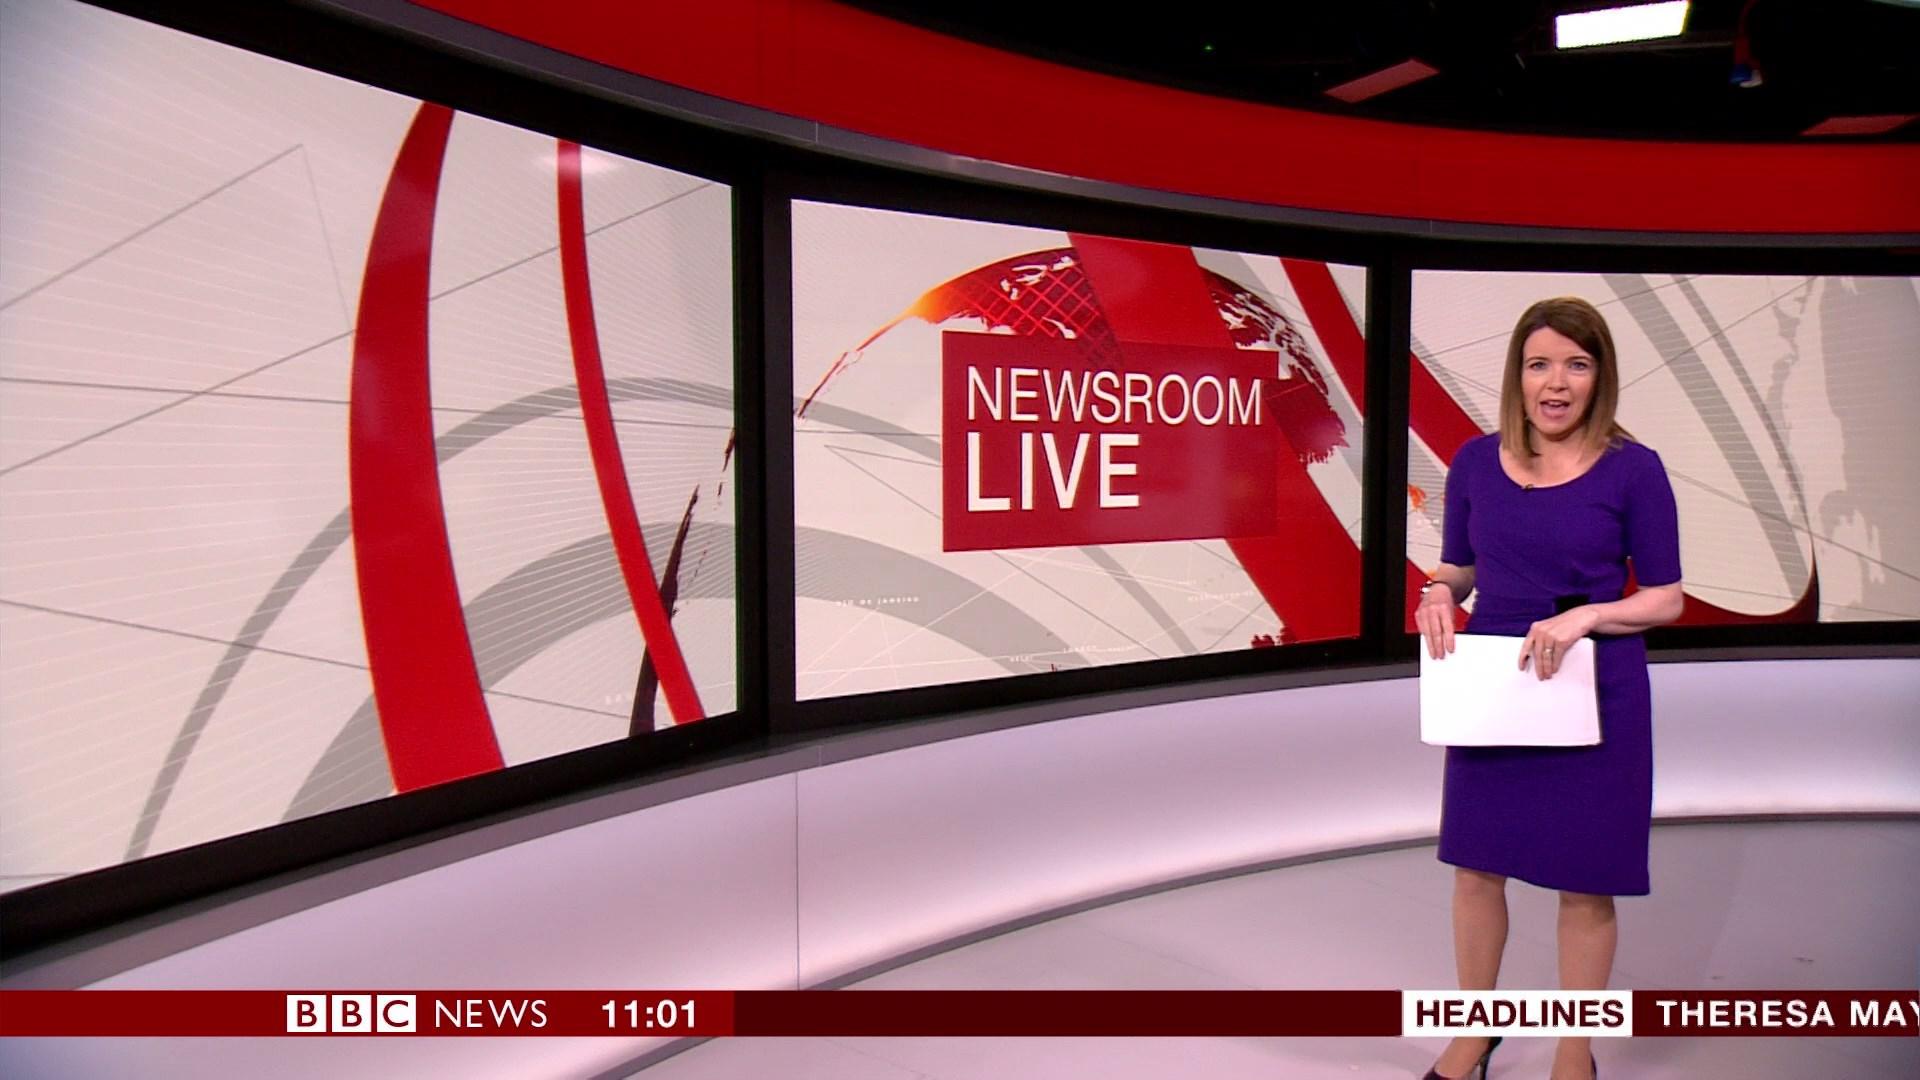 68343657_bbc-newsroom-live_20180416_11001200-ts_snapshot_00-02-32_-2018-04-16_17-07-29.jpg